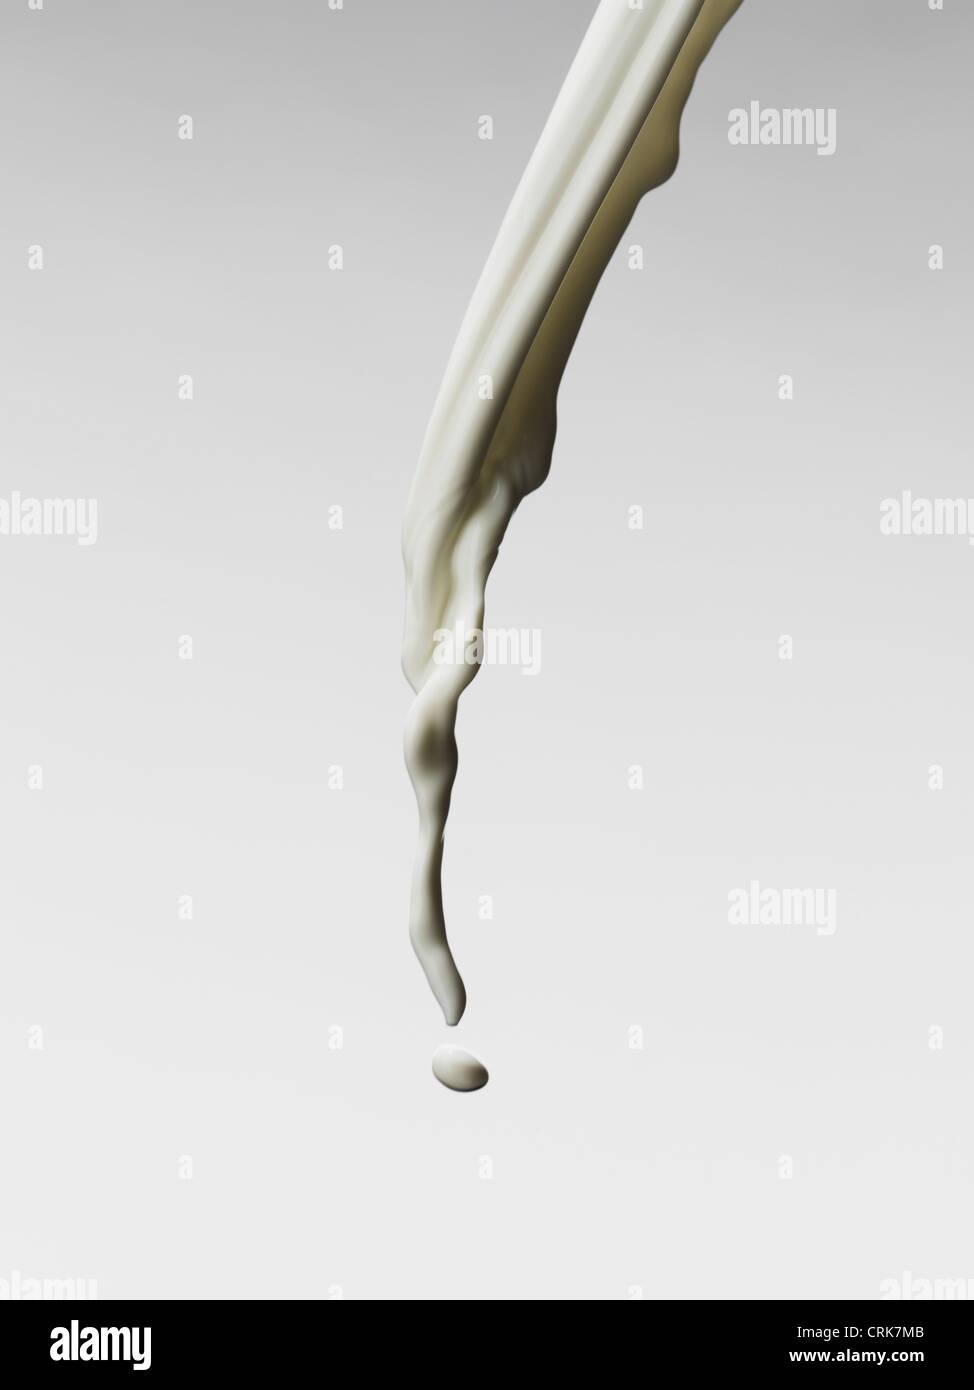 Cerca de verter la leche Imagen De Stock